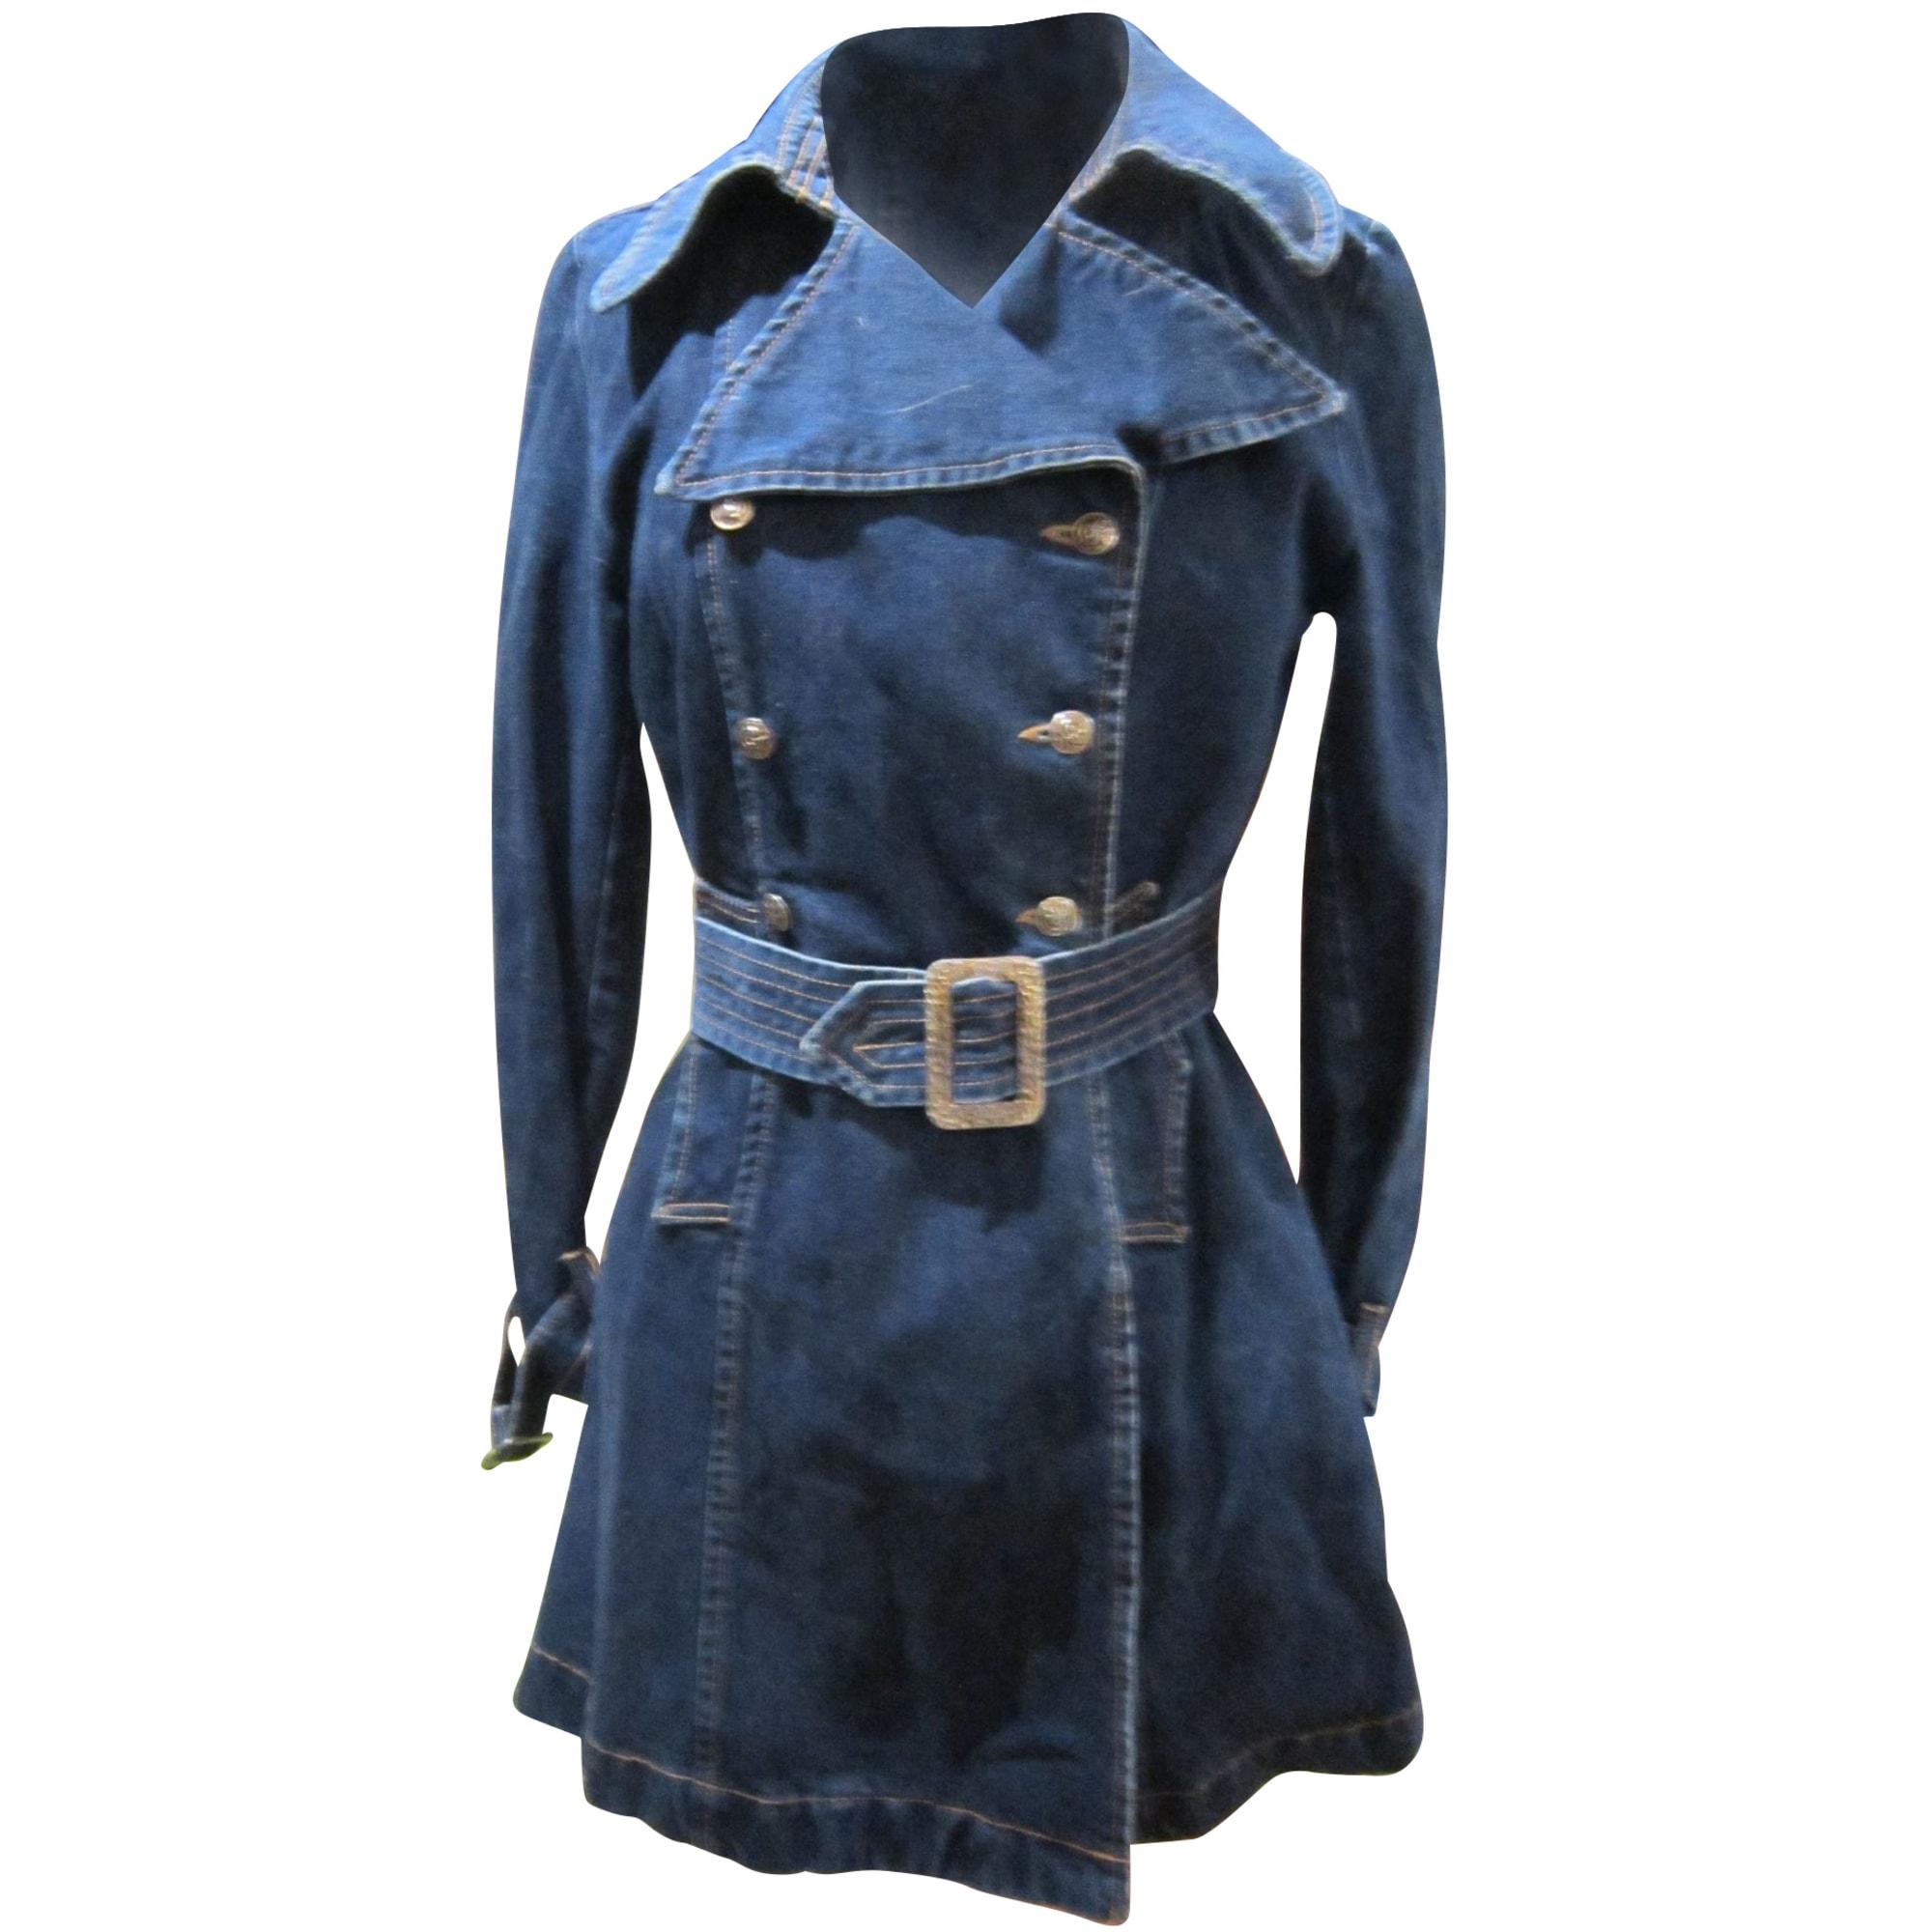 Manteau en jean CHRISTIAN LACROIX Bleu, bleu marine, bleu turquoise